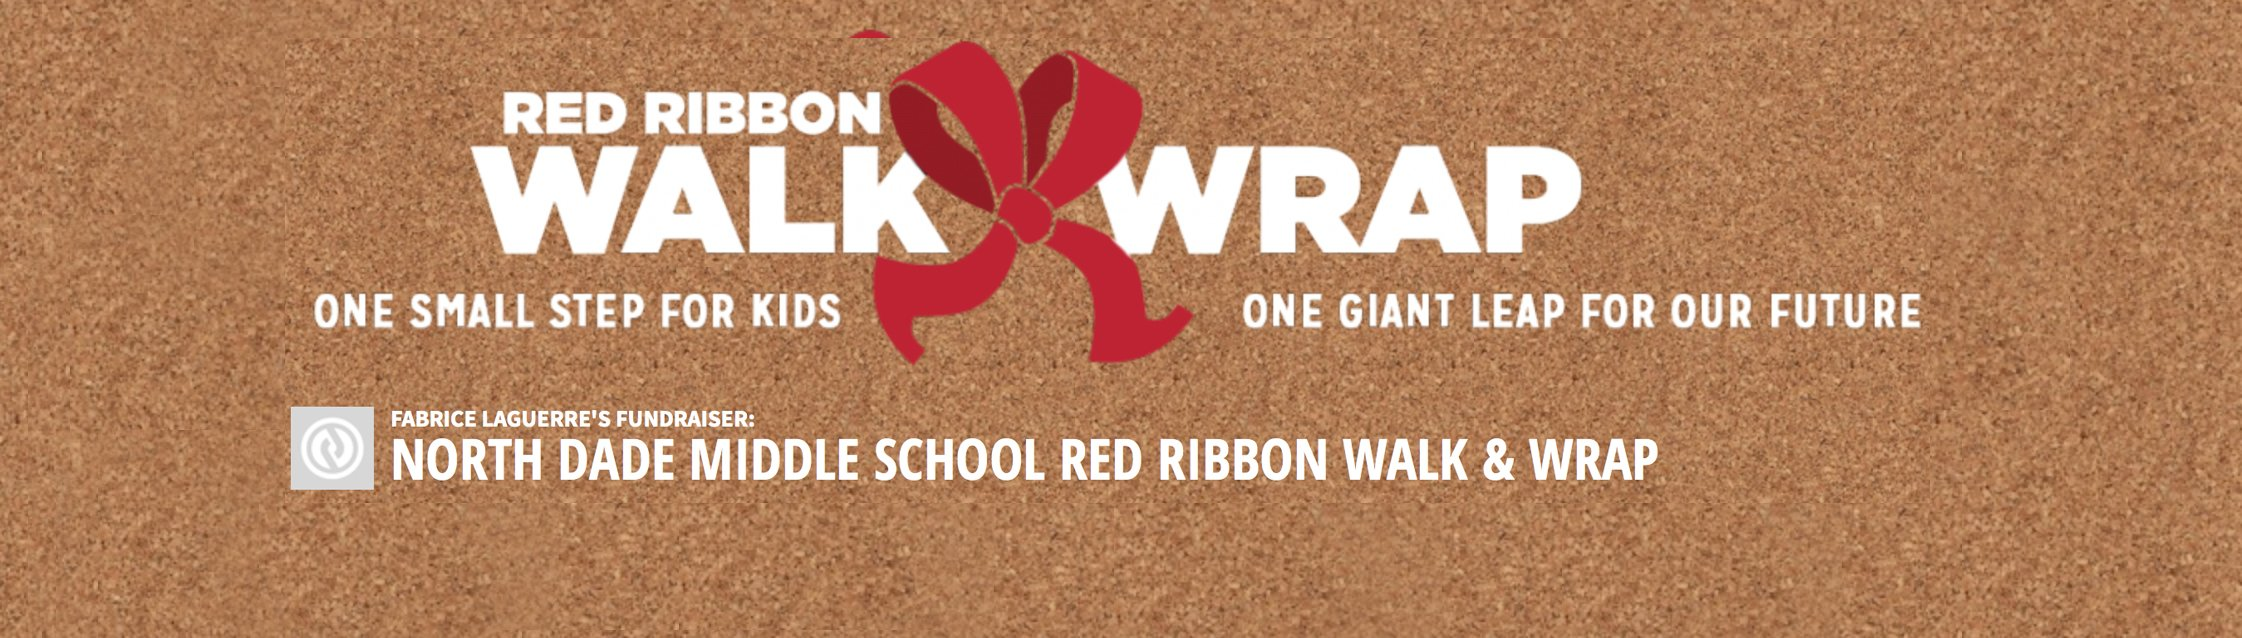 Walk-wrap